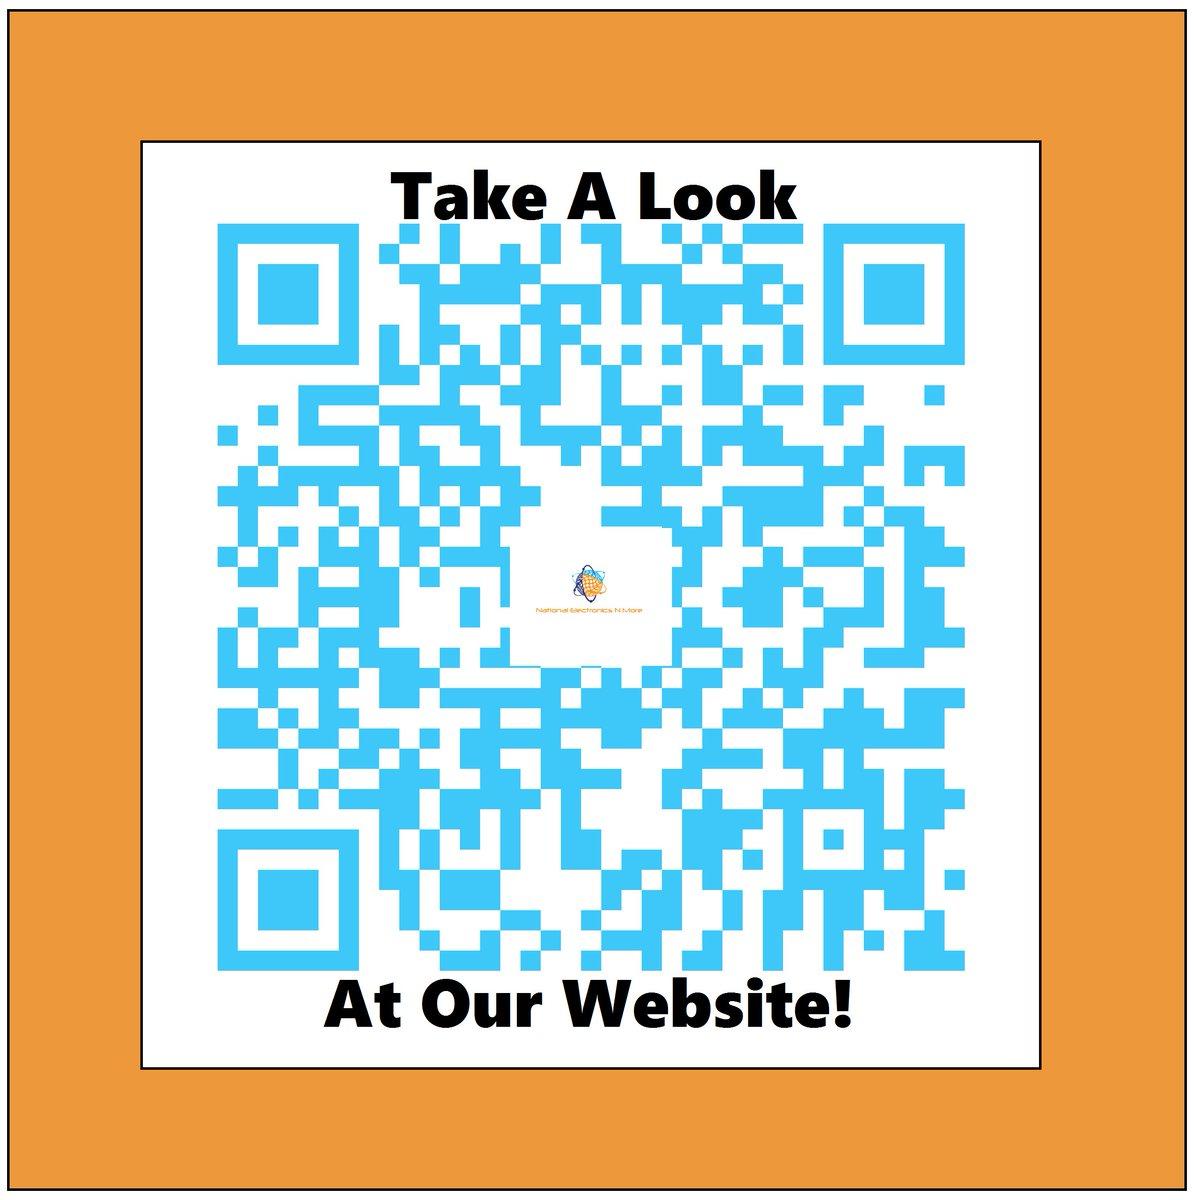 shop communicationsmediageographies